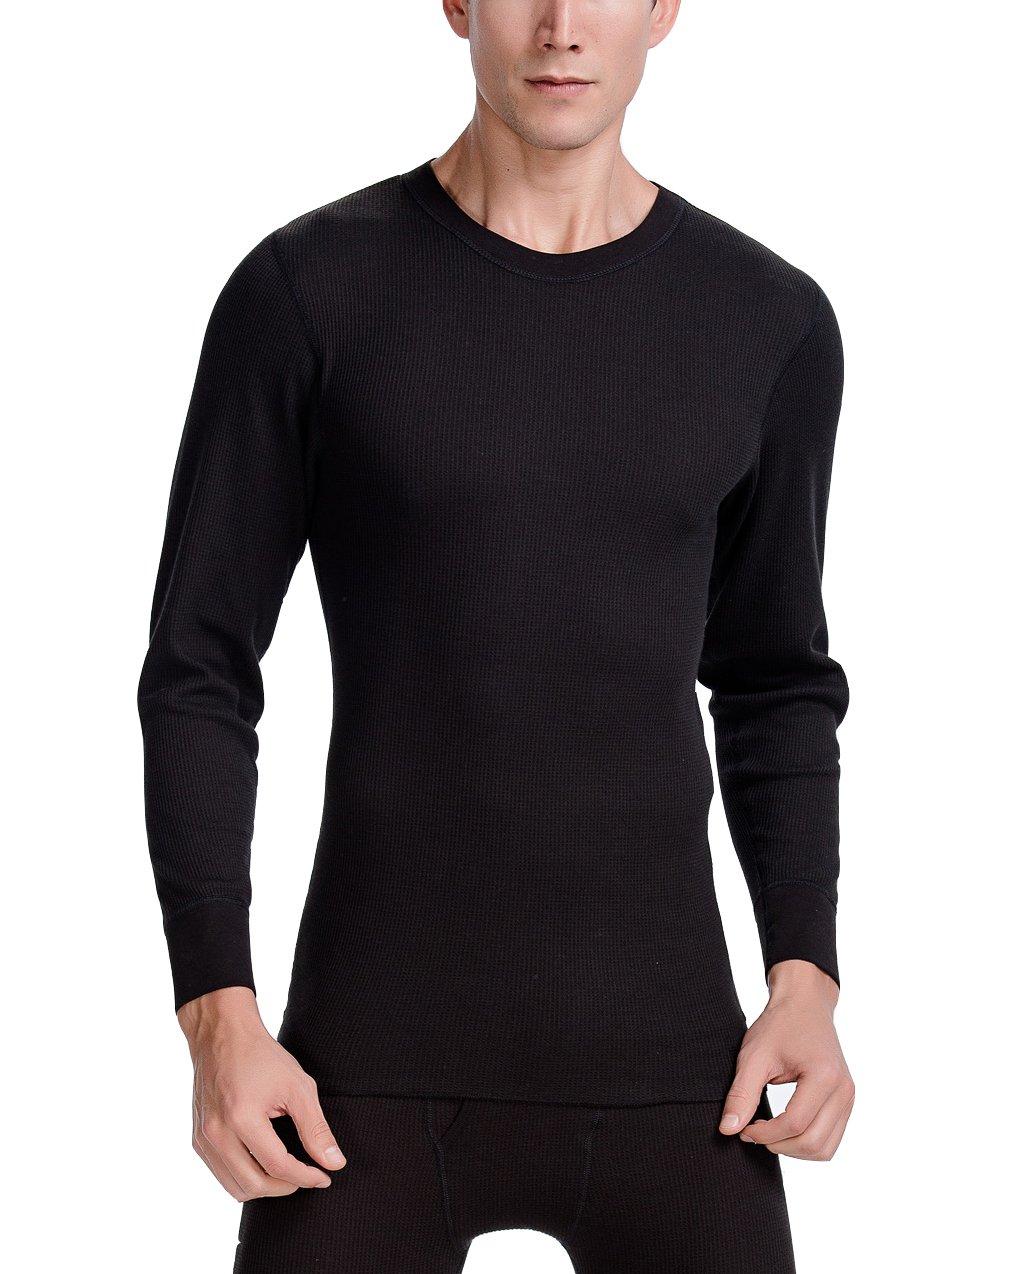 CYZ Collection CYZ Men's Thermal Long Sleeve Crew Top-Black-2XL